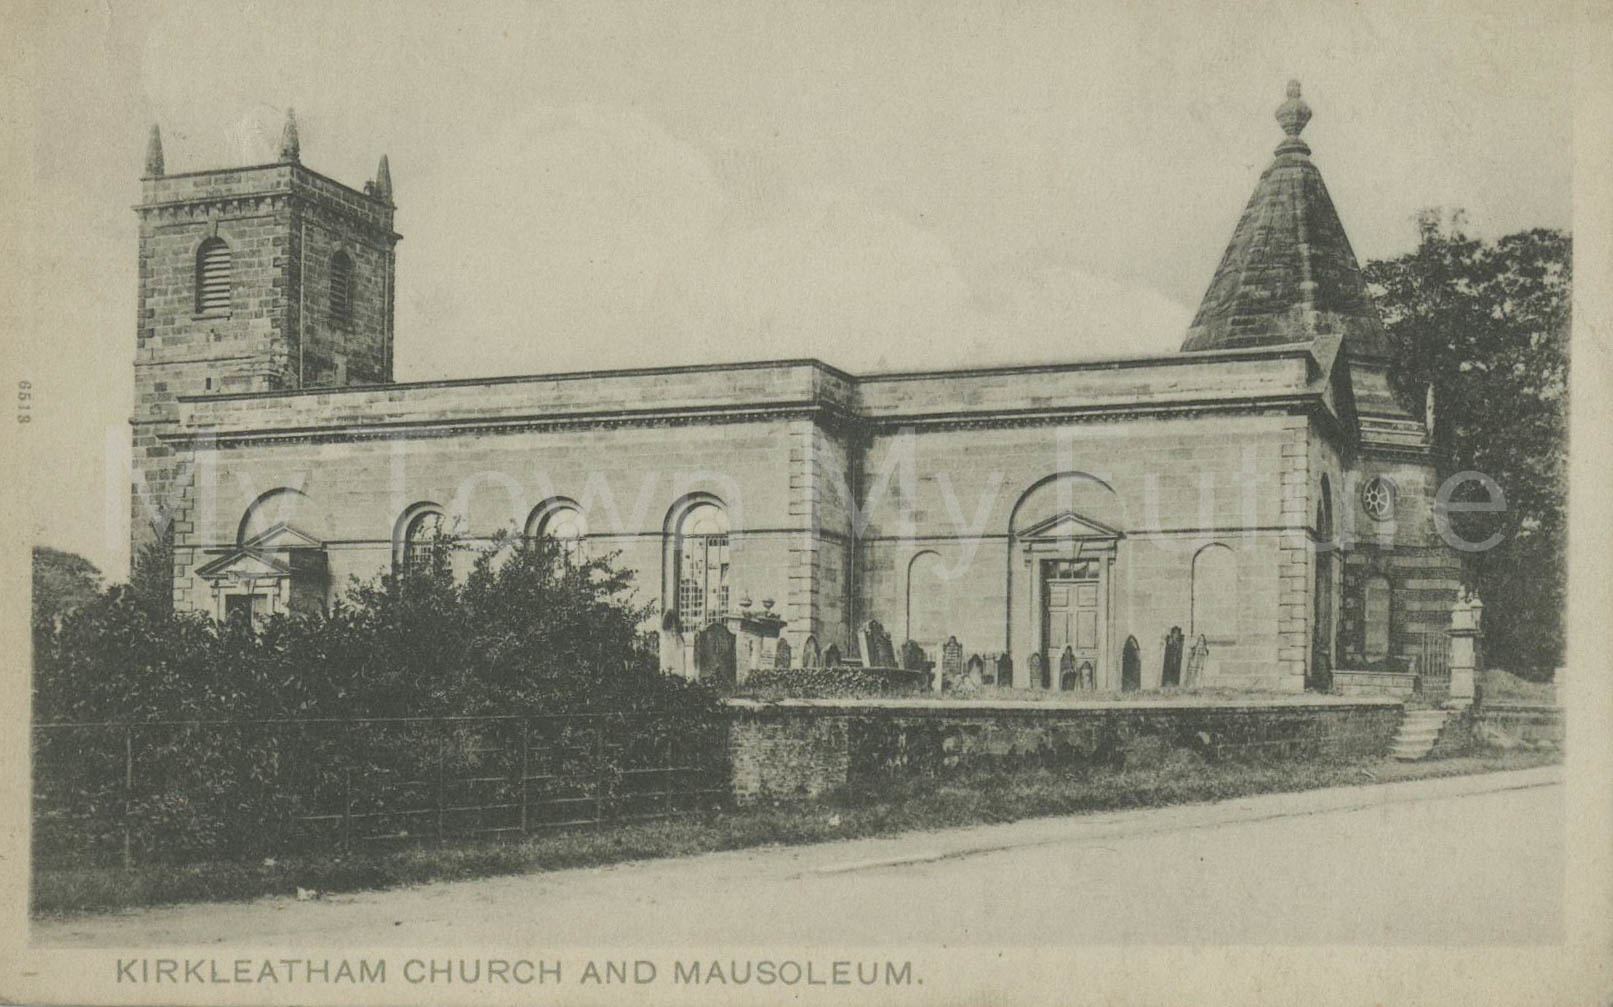 Kirkleatham Church